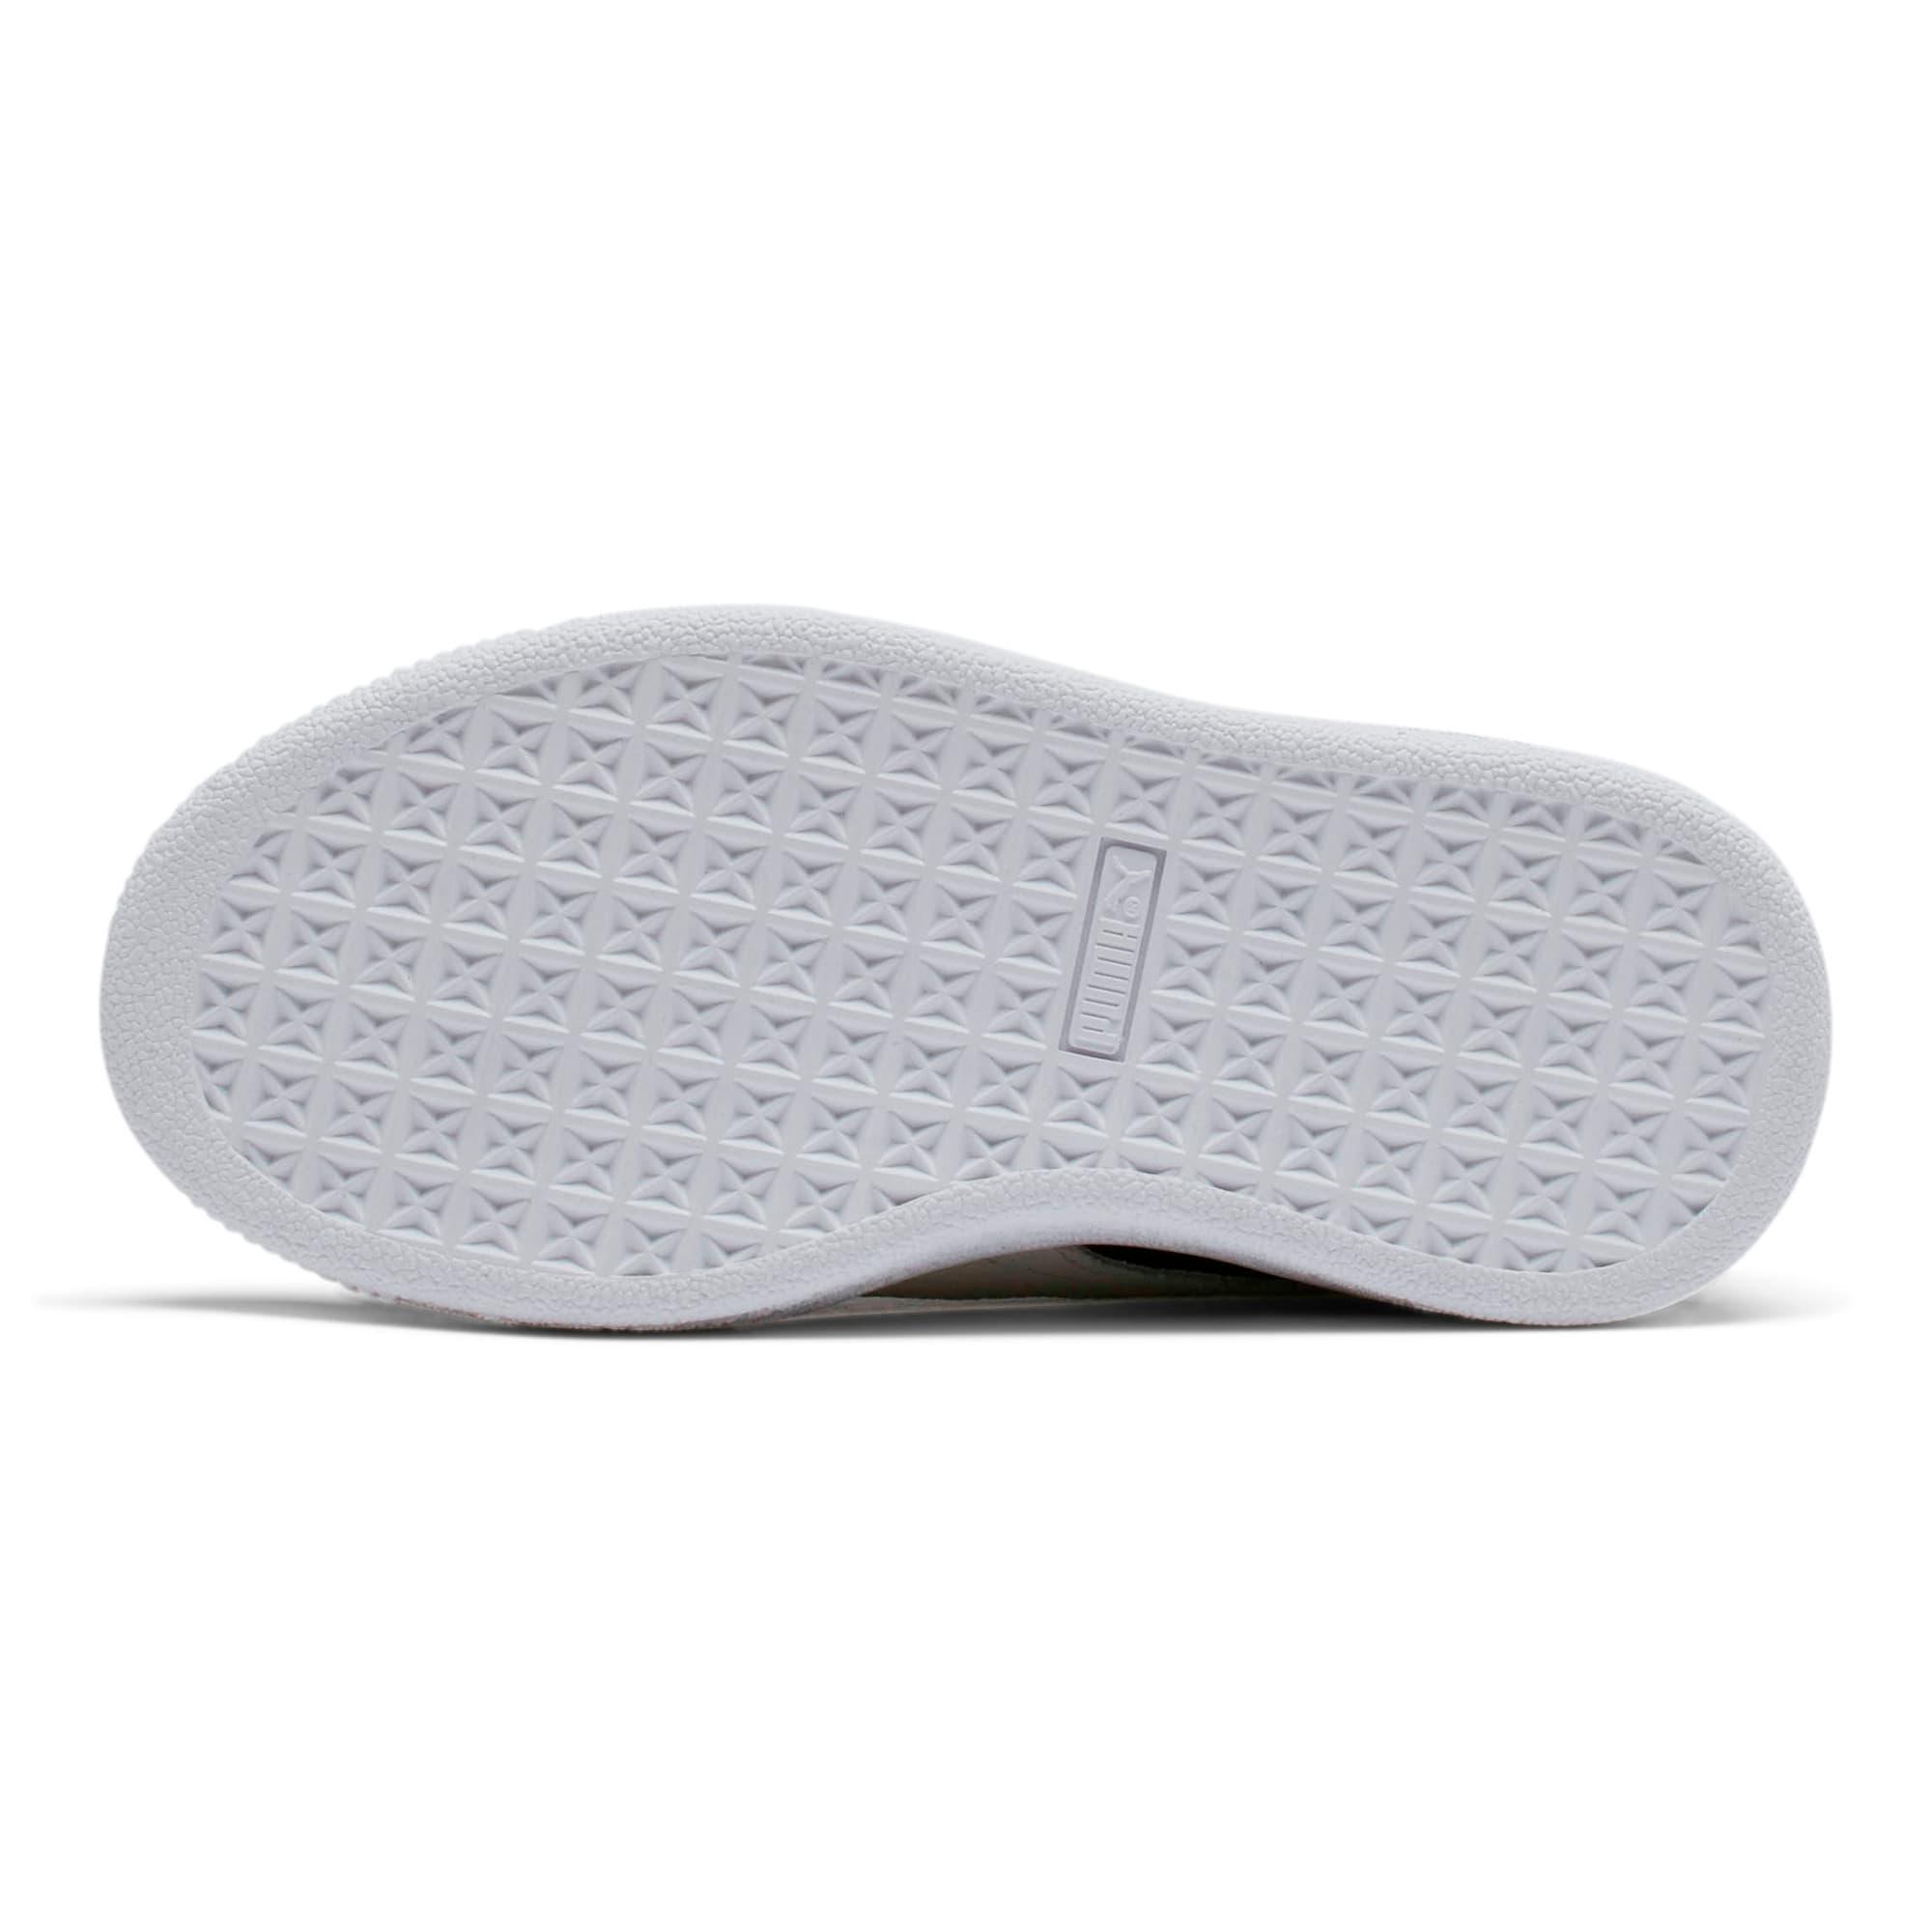 Thumbnail 3 of Suede Little Kids' Shoes, Puma Black-Puma White, medium